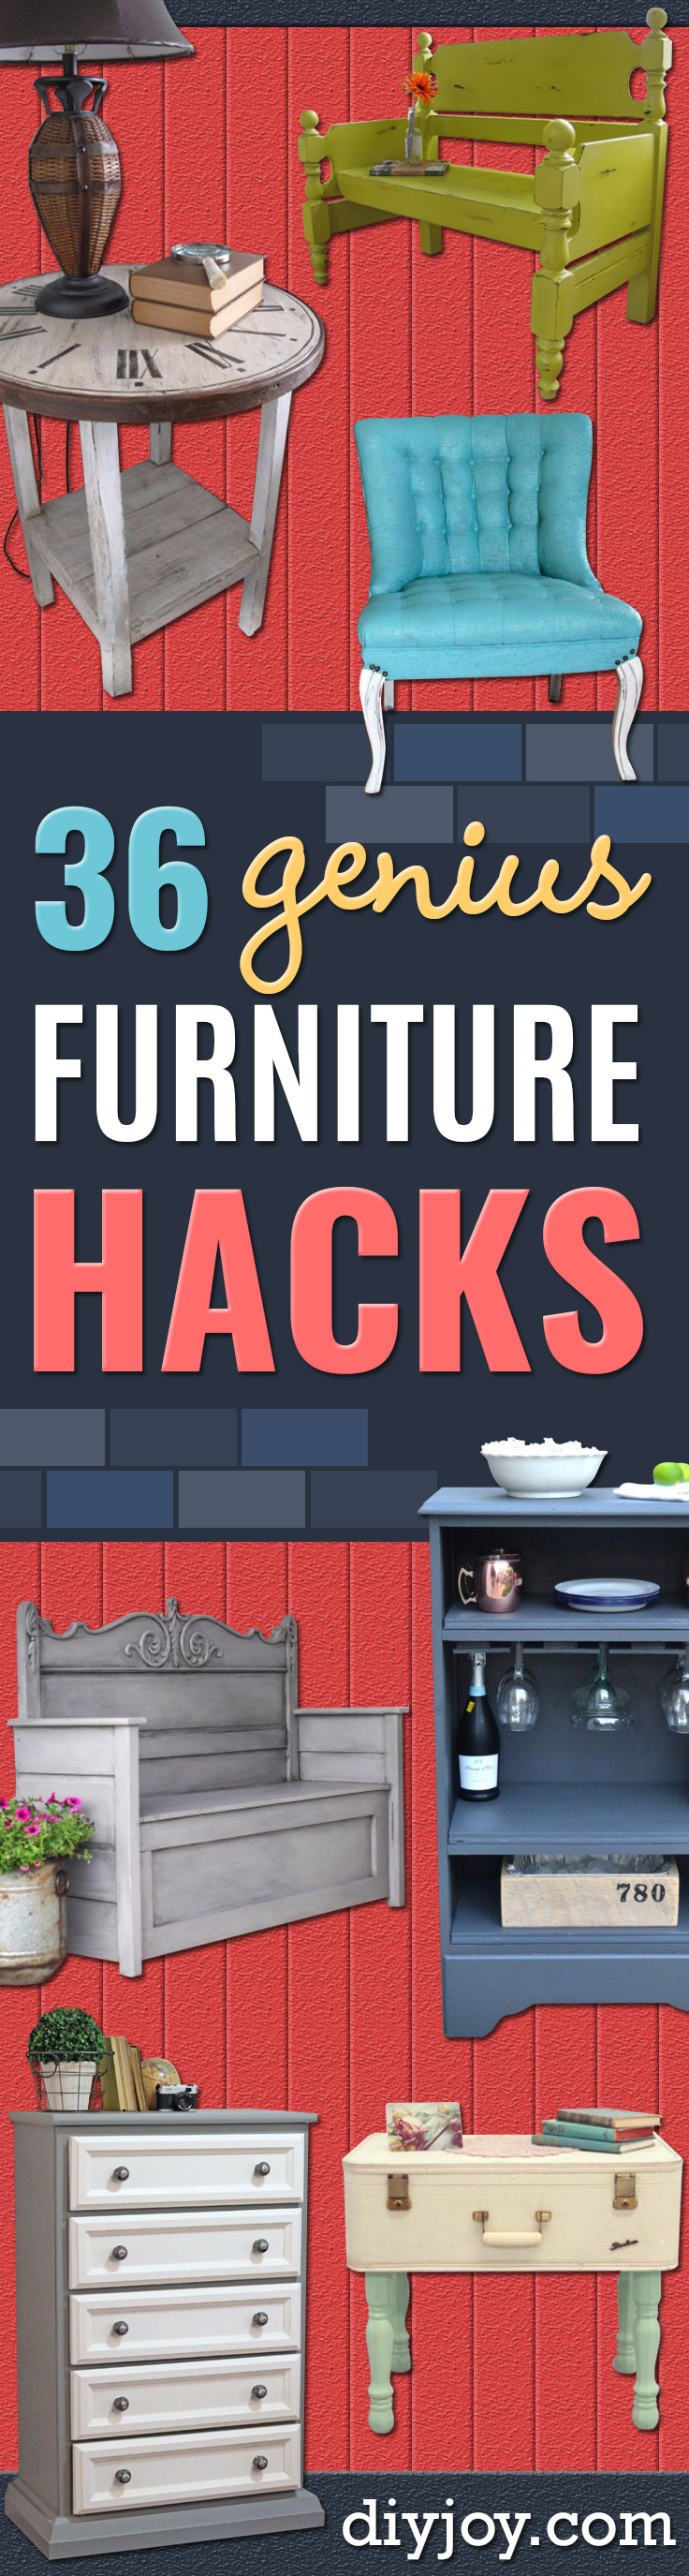 Best Furniture Hacks - Easy DIY Furniture Makeover Ideas for Cheap Home Decor - IKEA Hack Tutorials, Dressers, Cribs, Storage, For Kids, Bedroom and Good Ideas for Bath - Anthropologie, Walmart, Kmart, Target http://diyjoy.com/best-furniture-hacks